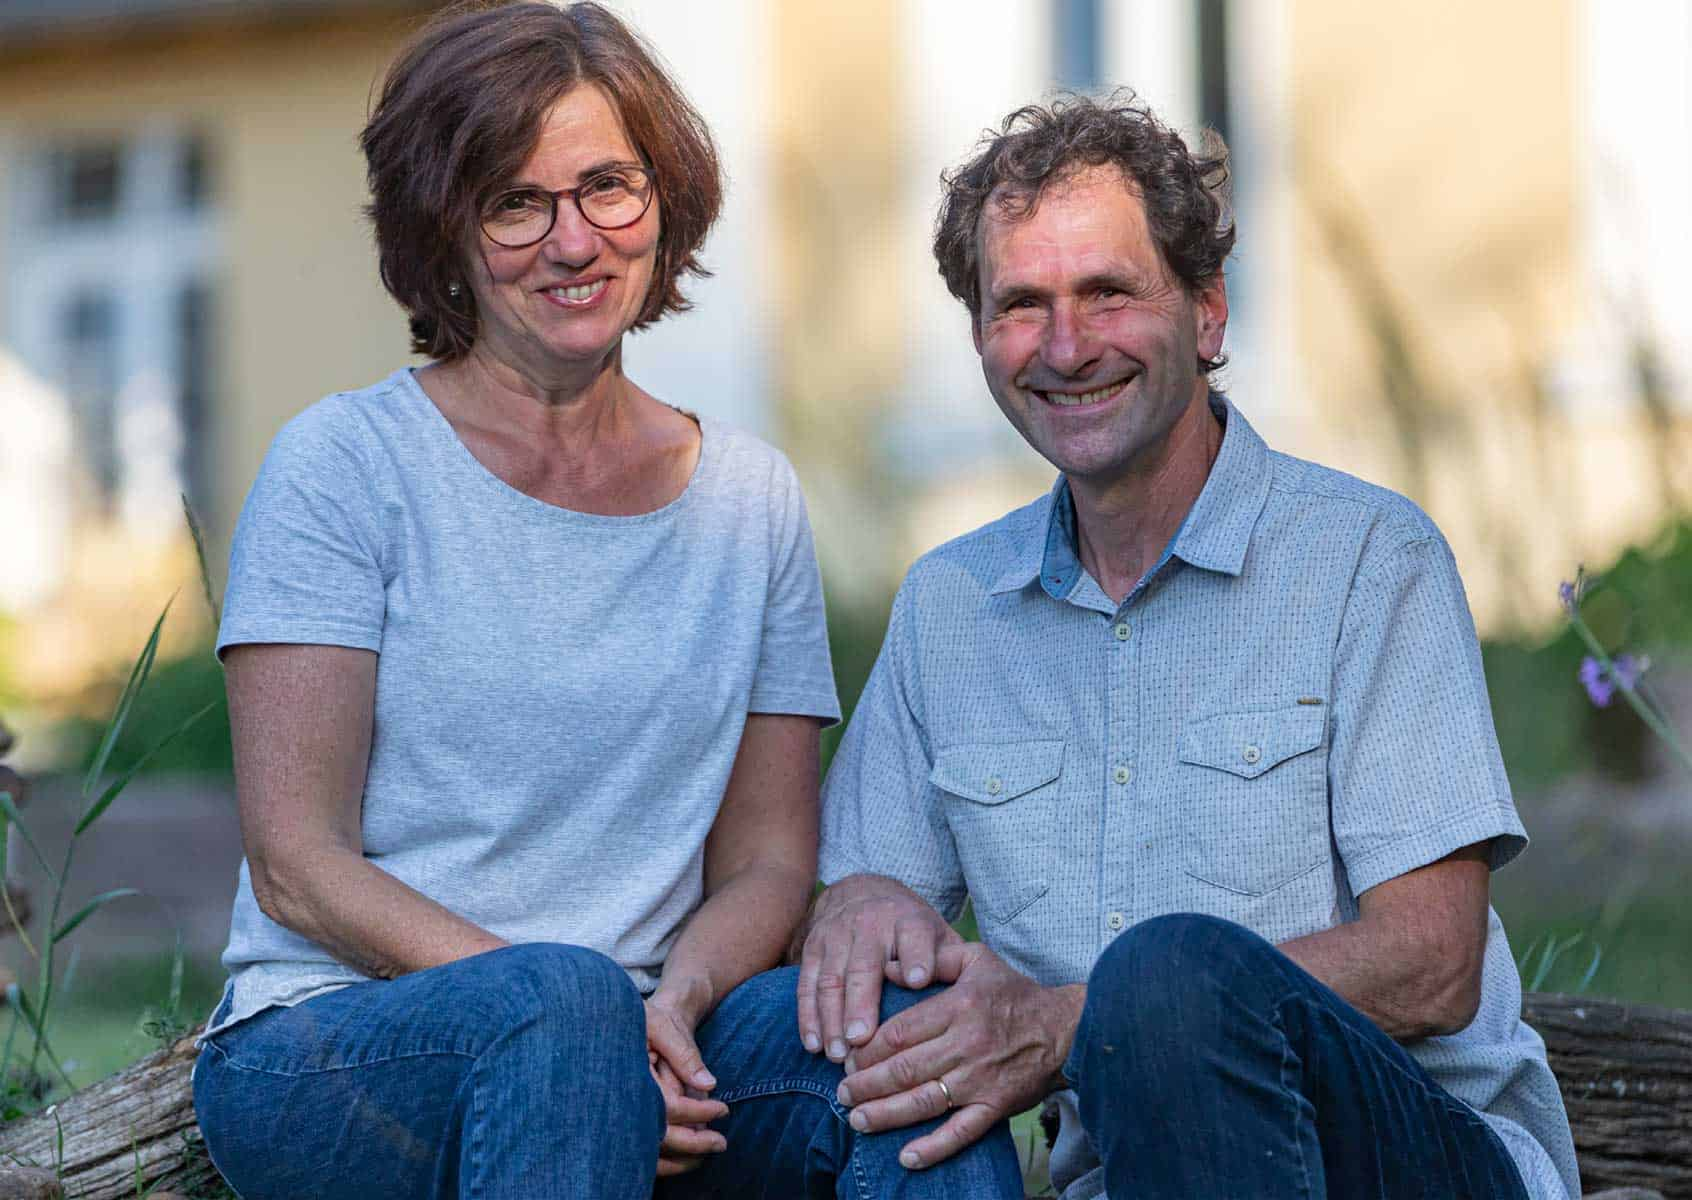 Ehepaar Junge vom Selgenhof